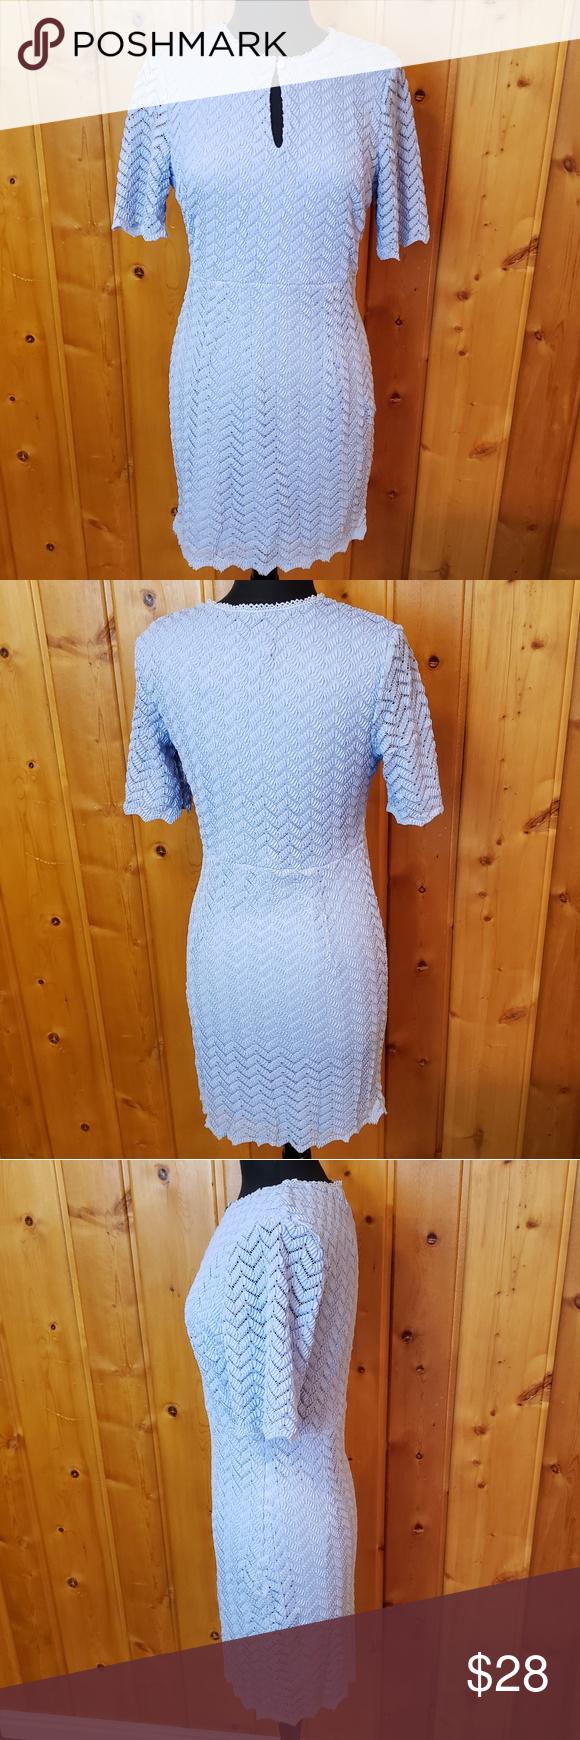 INA Lace Dress INA Lace Dress INA blue lace overla